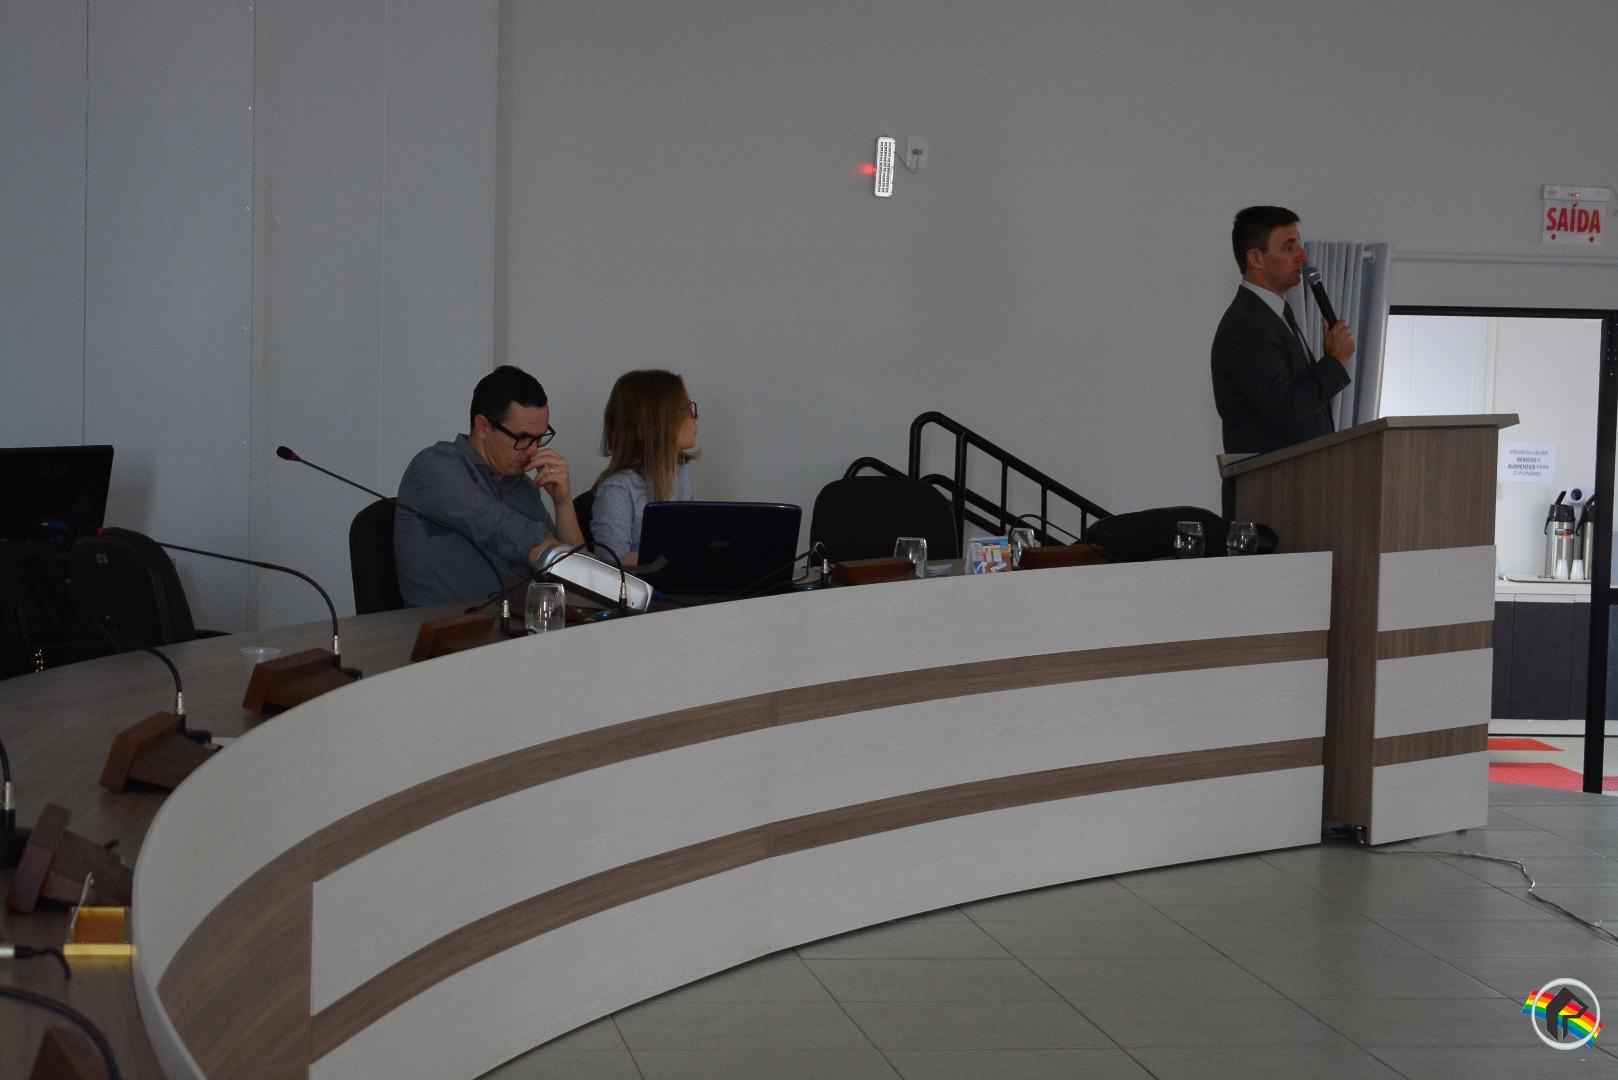 Justiça Federal vai distribuir R$ 185 mil para entidades do município